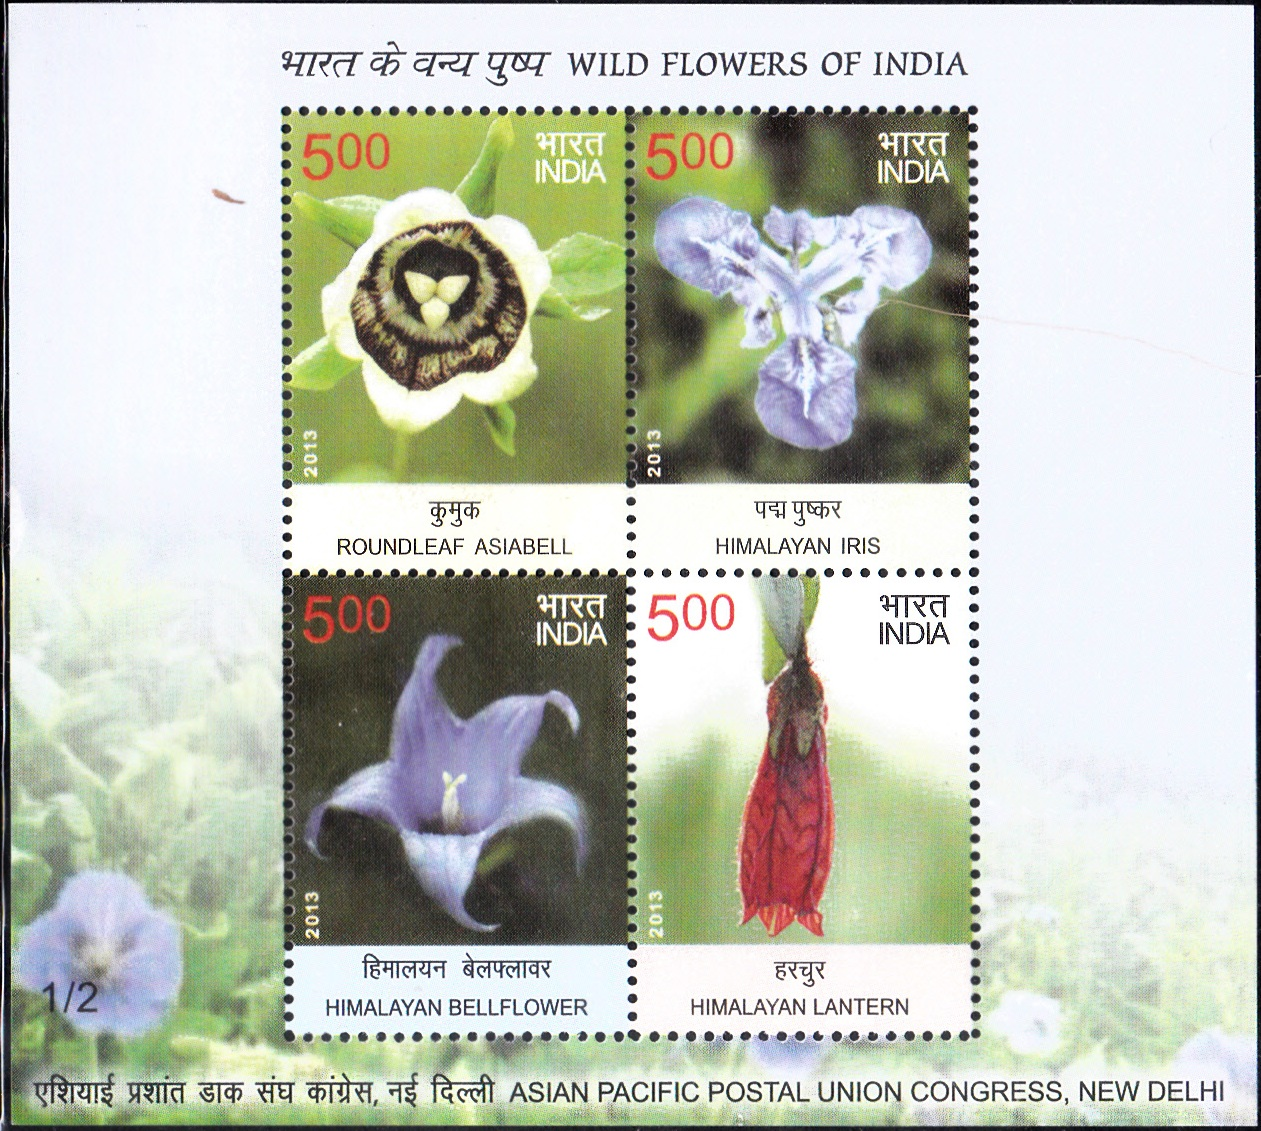 Roundleaf Asiabell, Himalayan Iris, Himalayan Bellflower & Himalayan Lantern